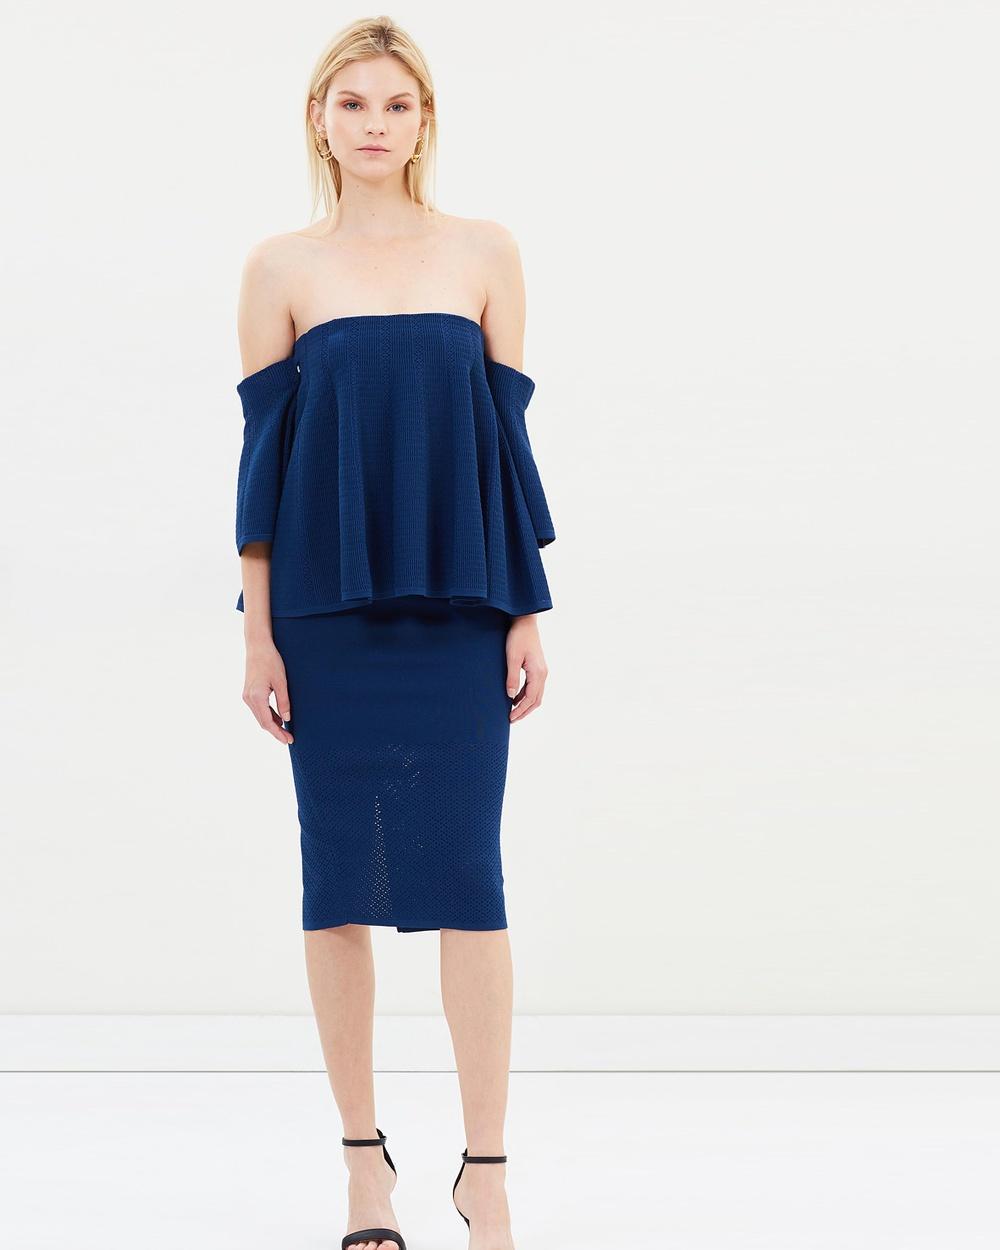 Sass & Bide Dreamscape Knit Dress Dresses Submarine Dreamscape Knit Dress